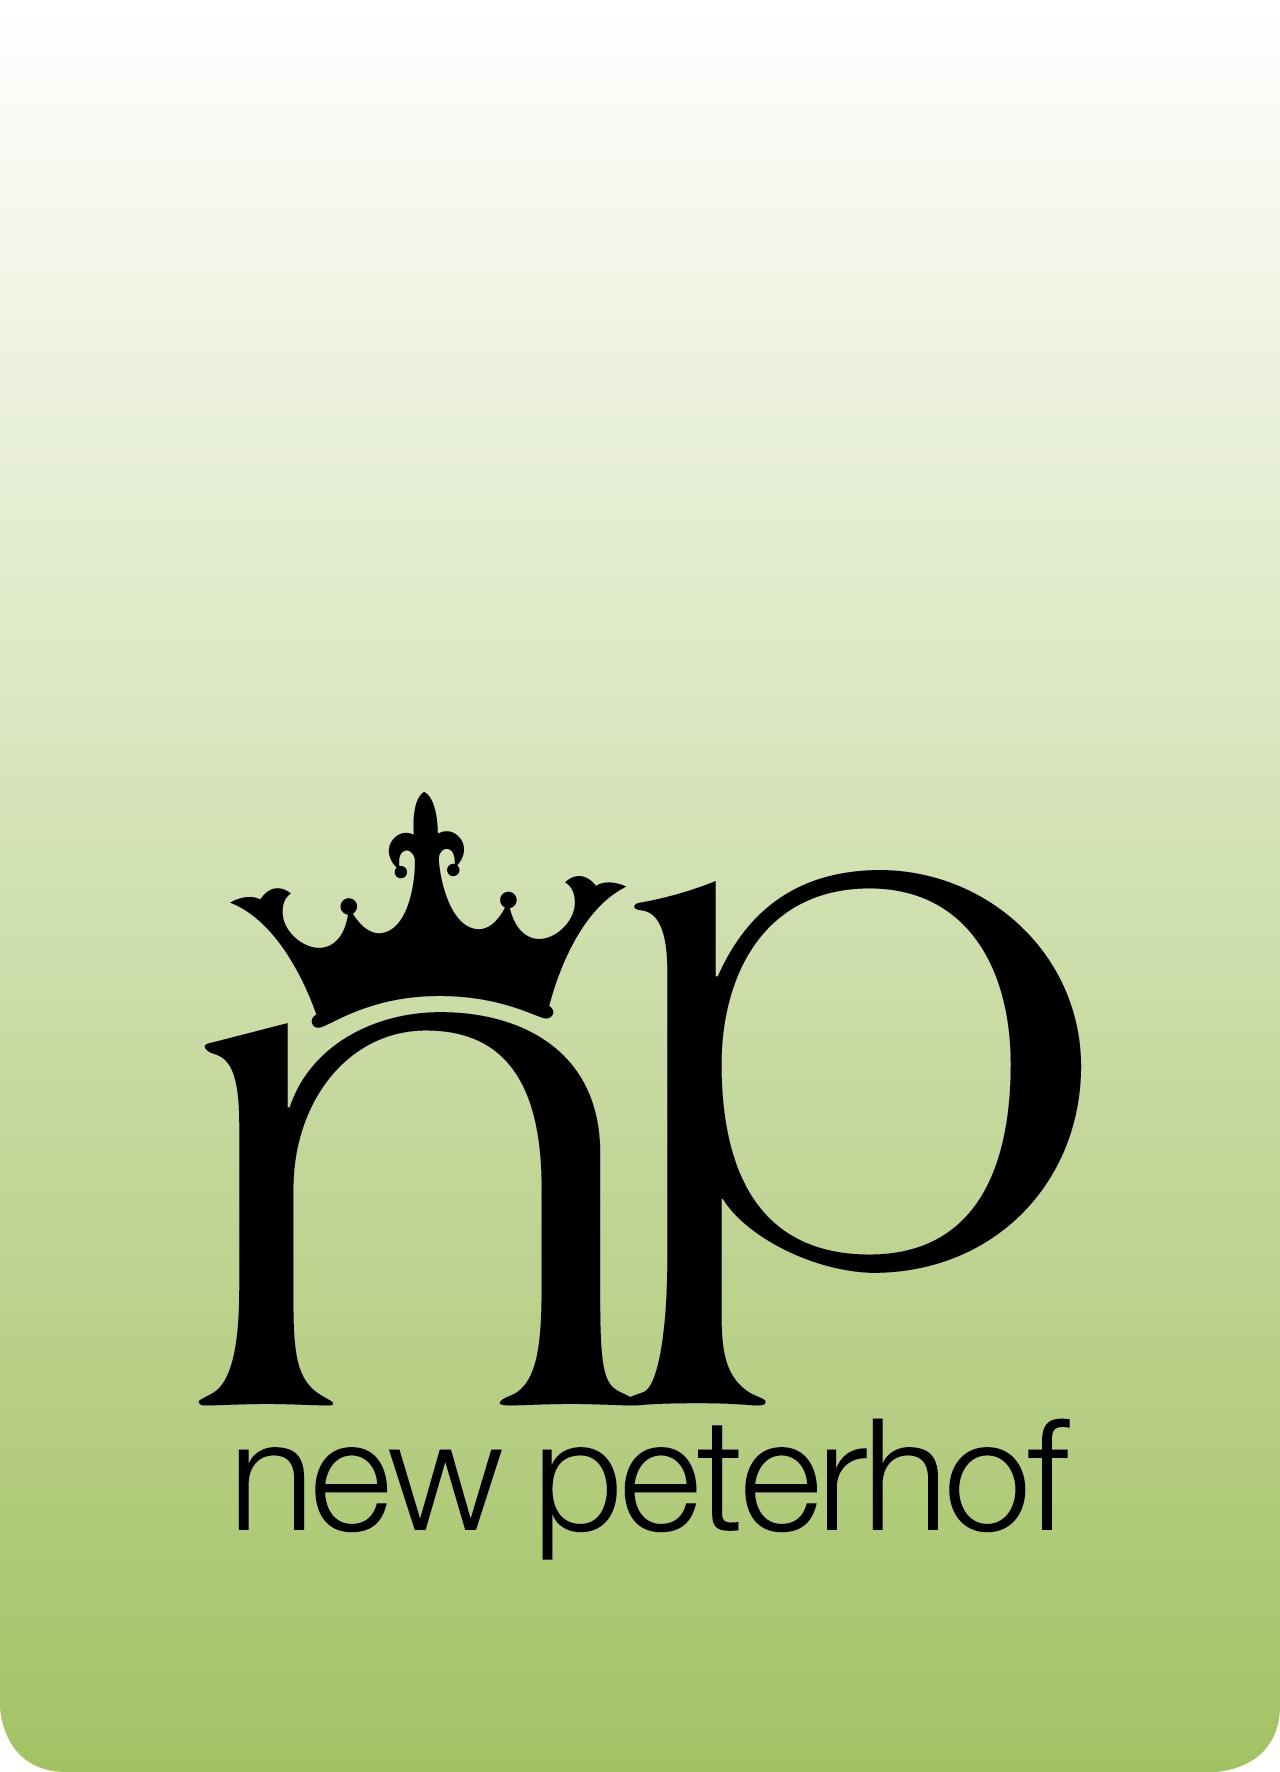 New Peterhof Hotel LOGO.jpg